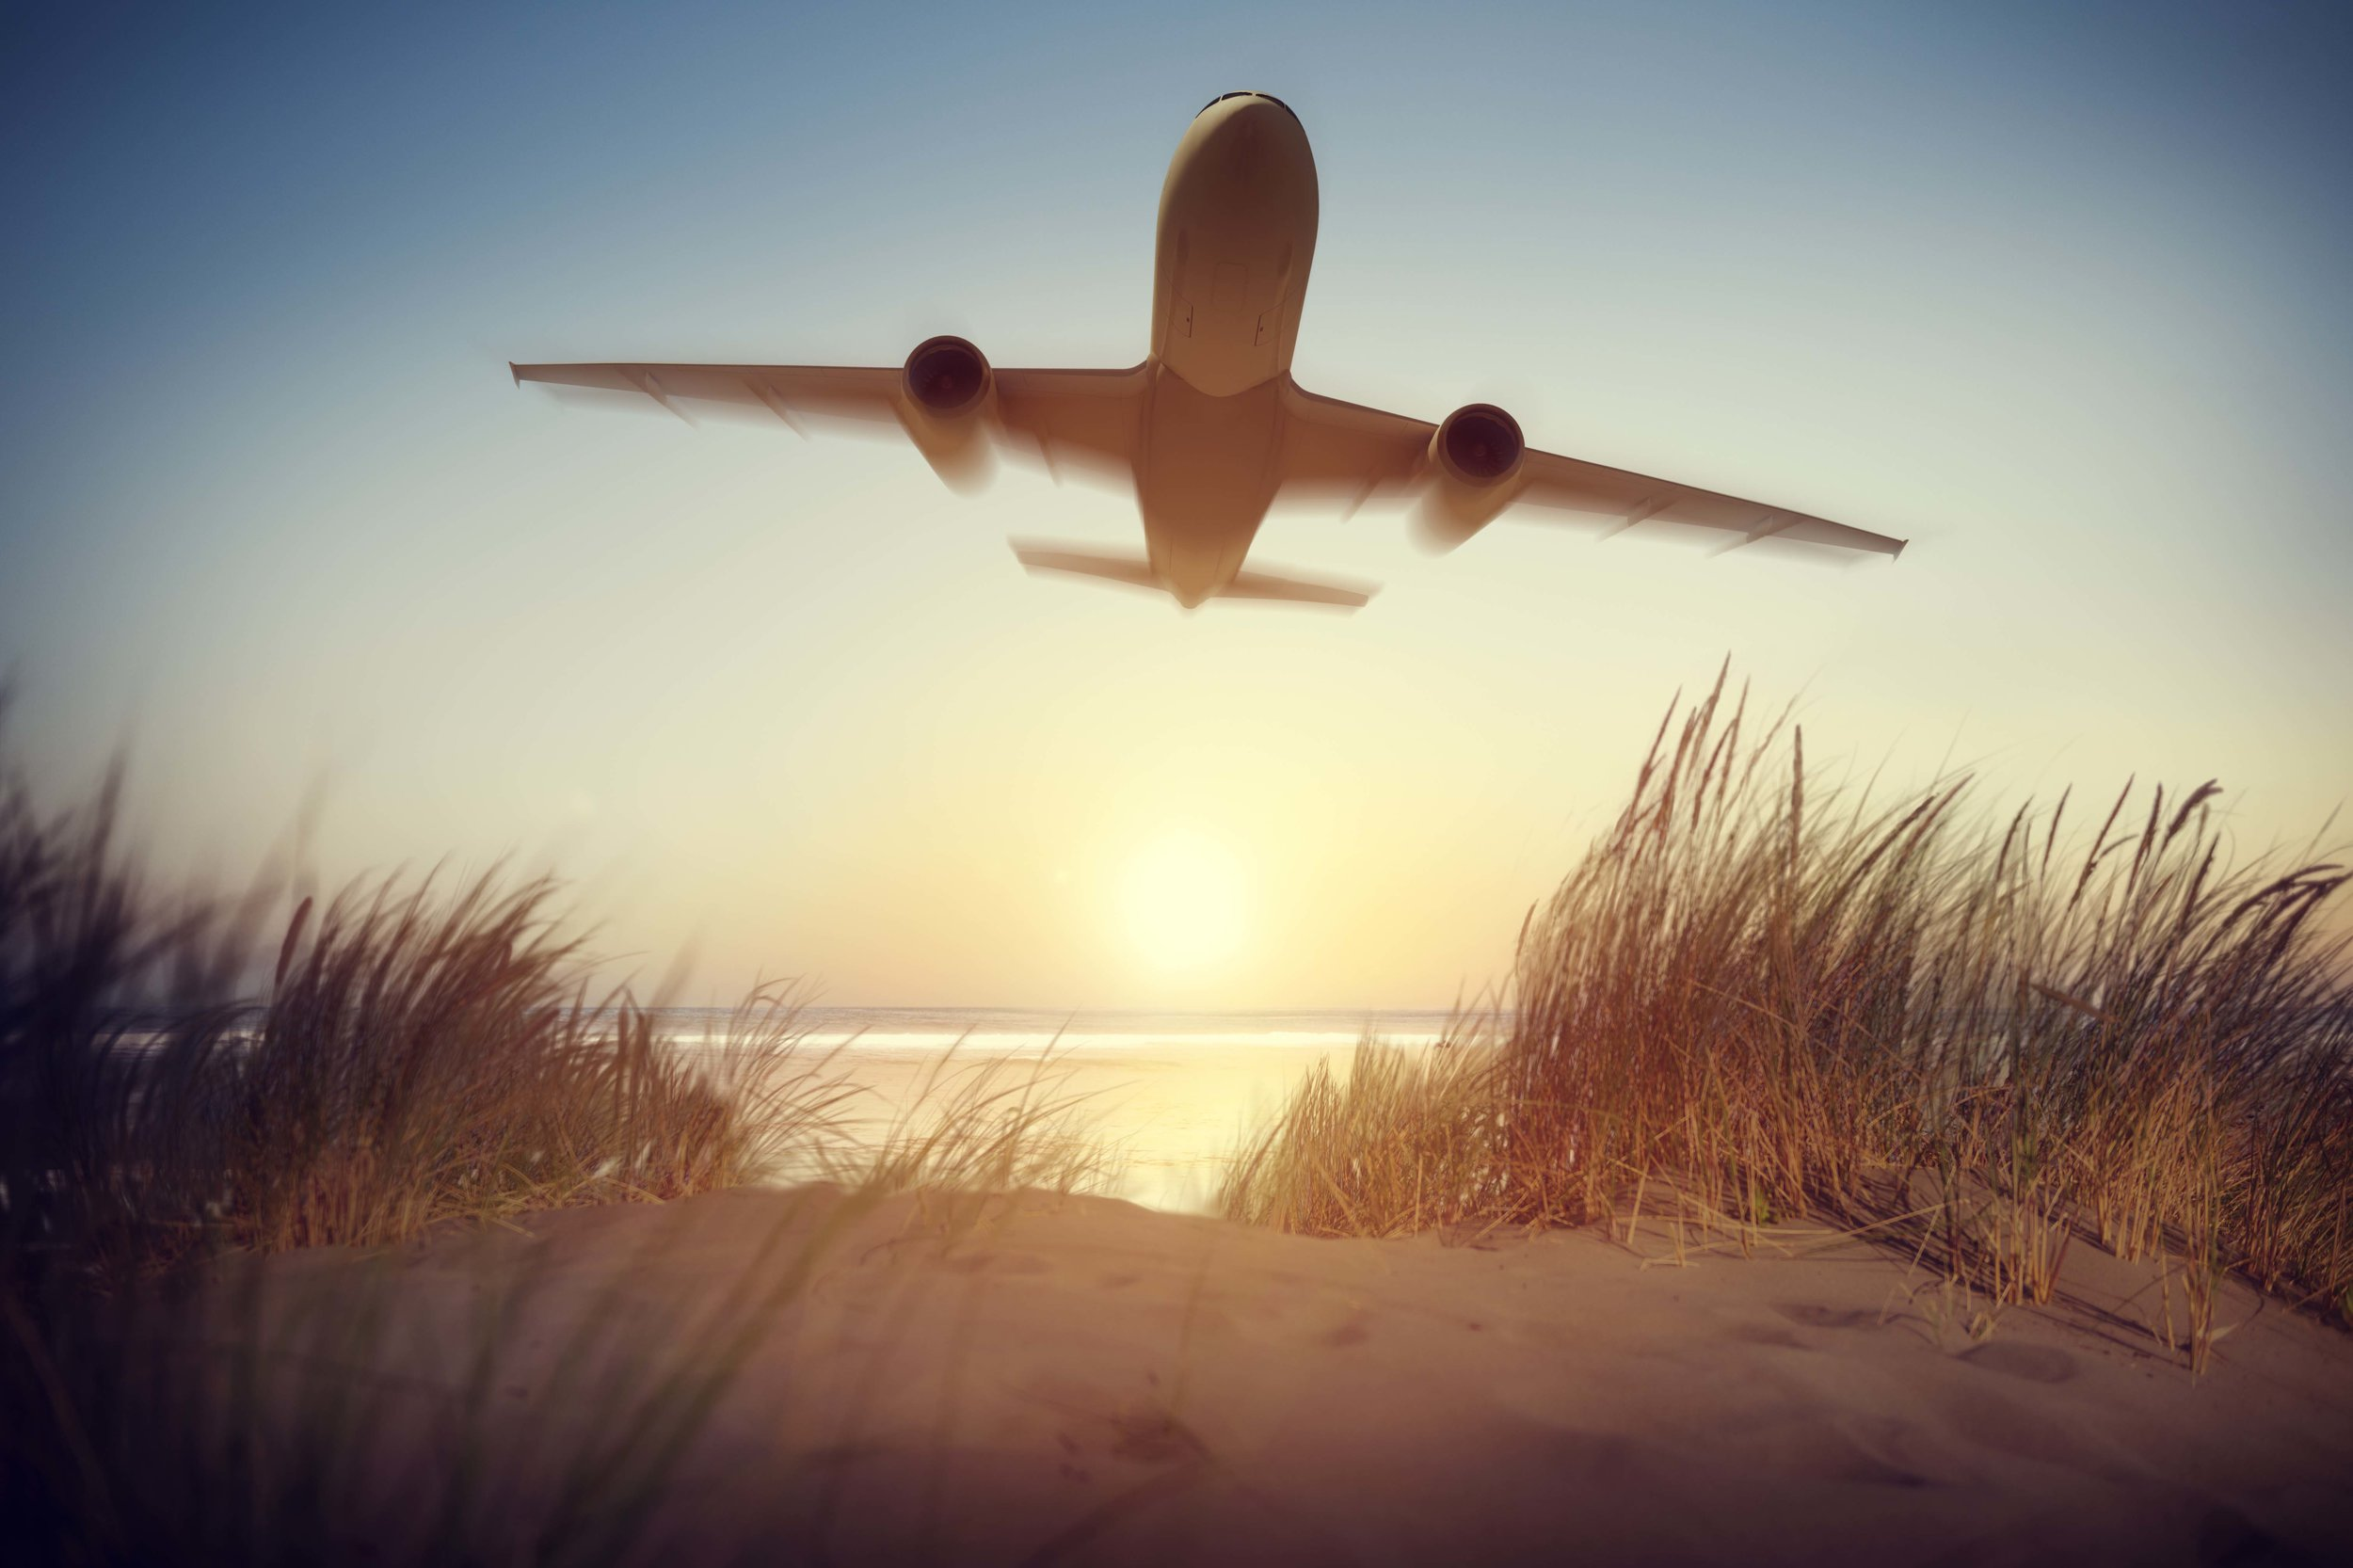 Aircraft & Aviation